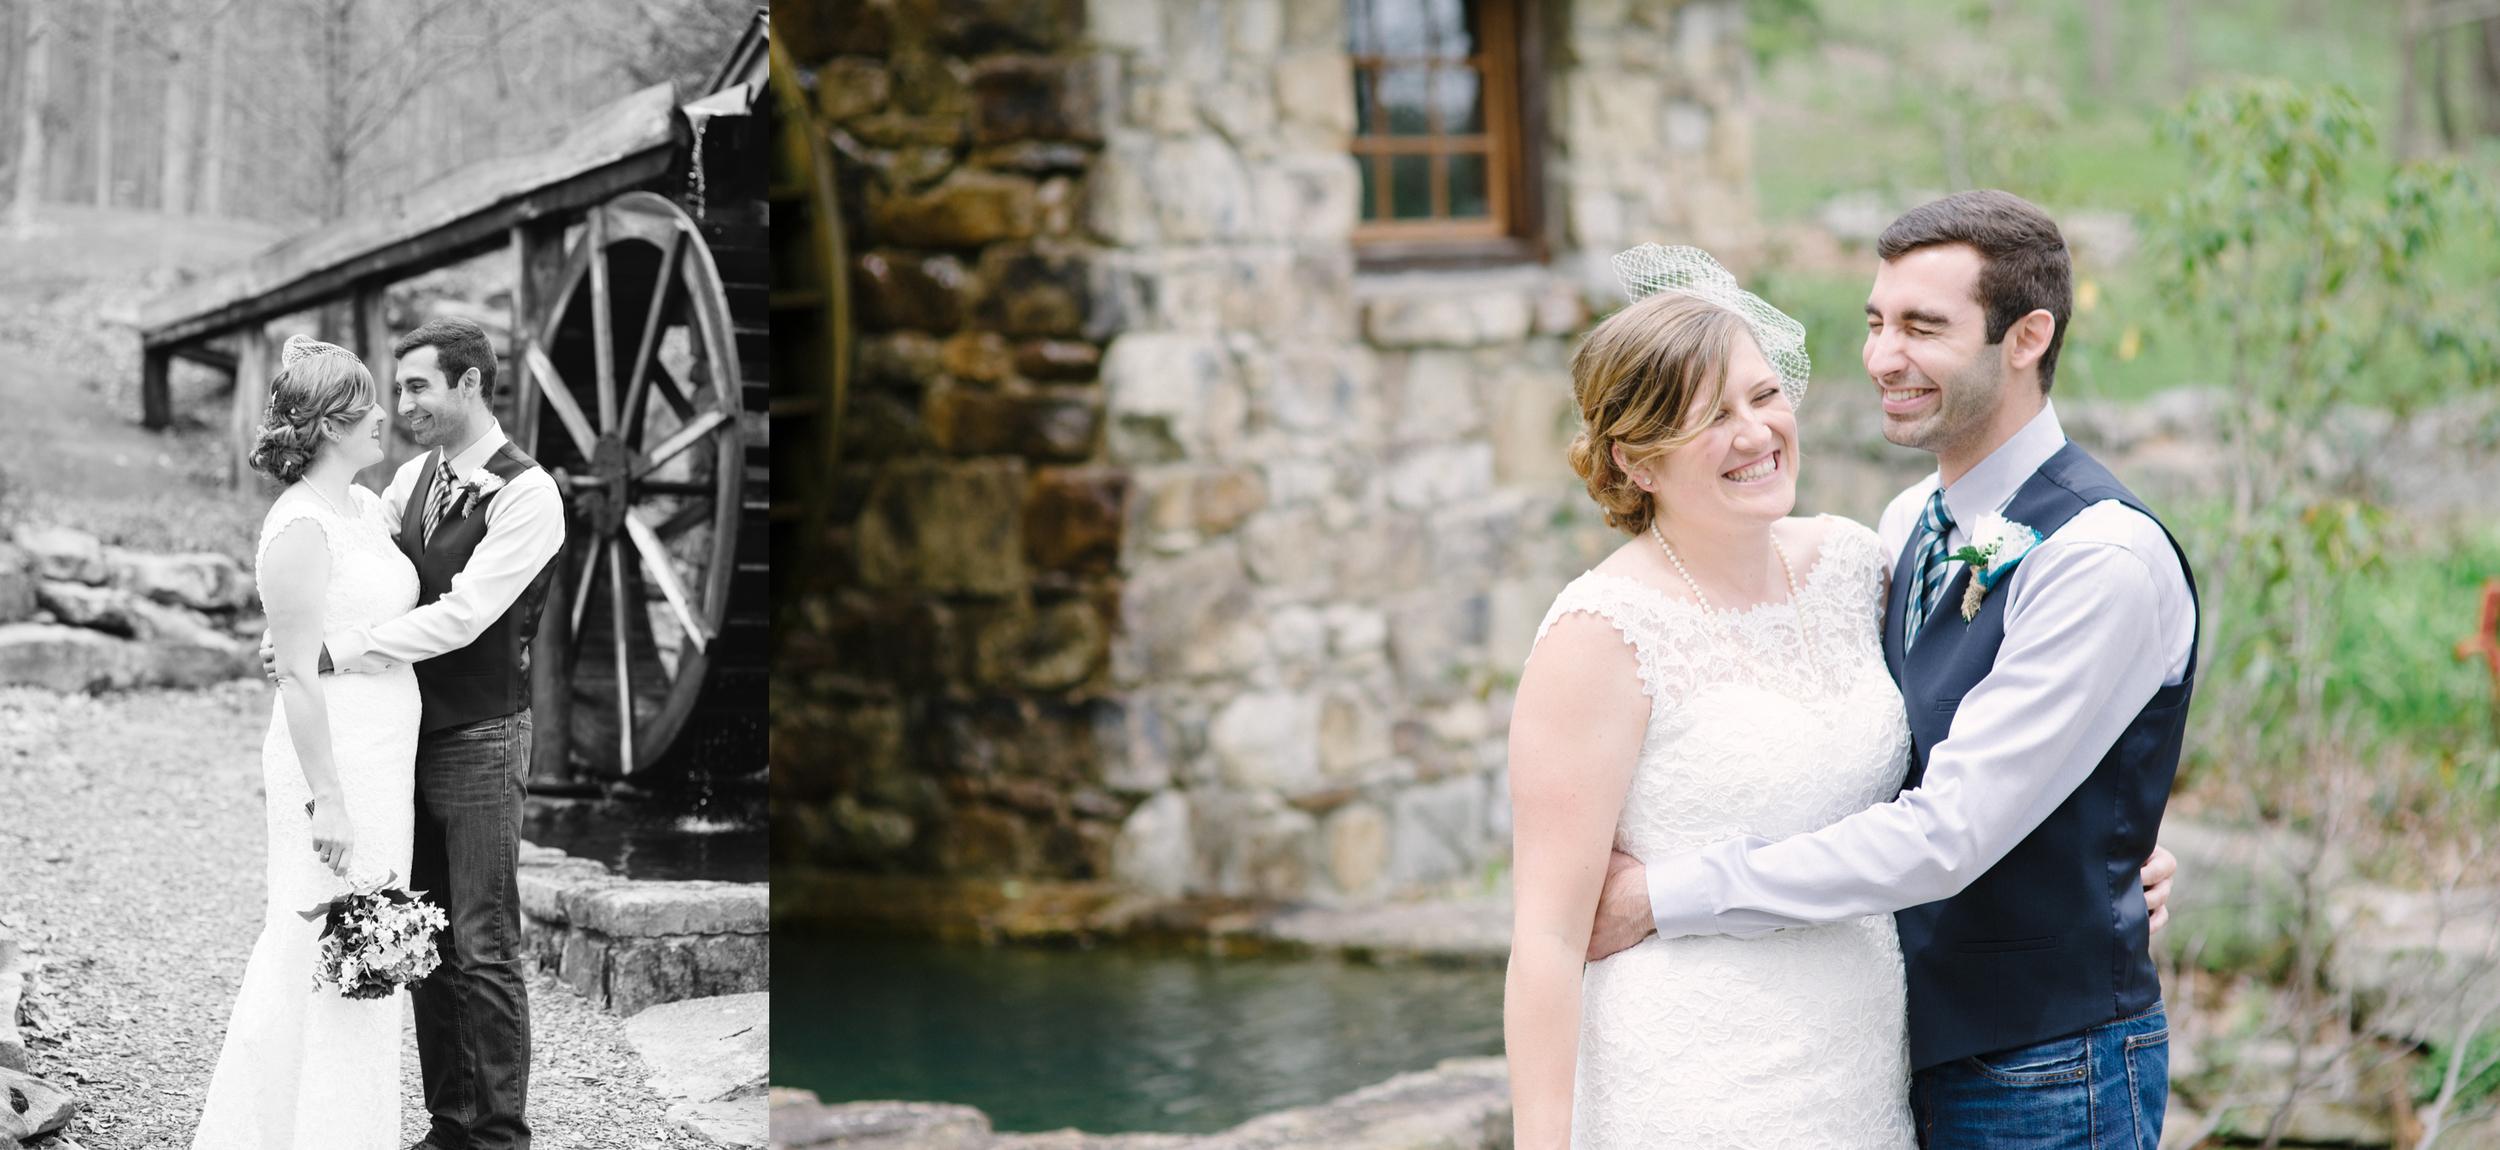 Oak Lodge Wedding Photography Mariah Fisher Ligonier Photographer.jpg